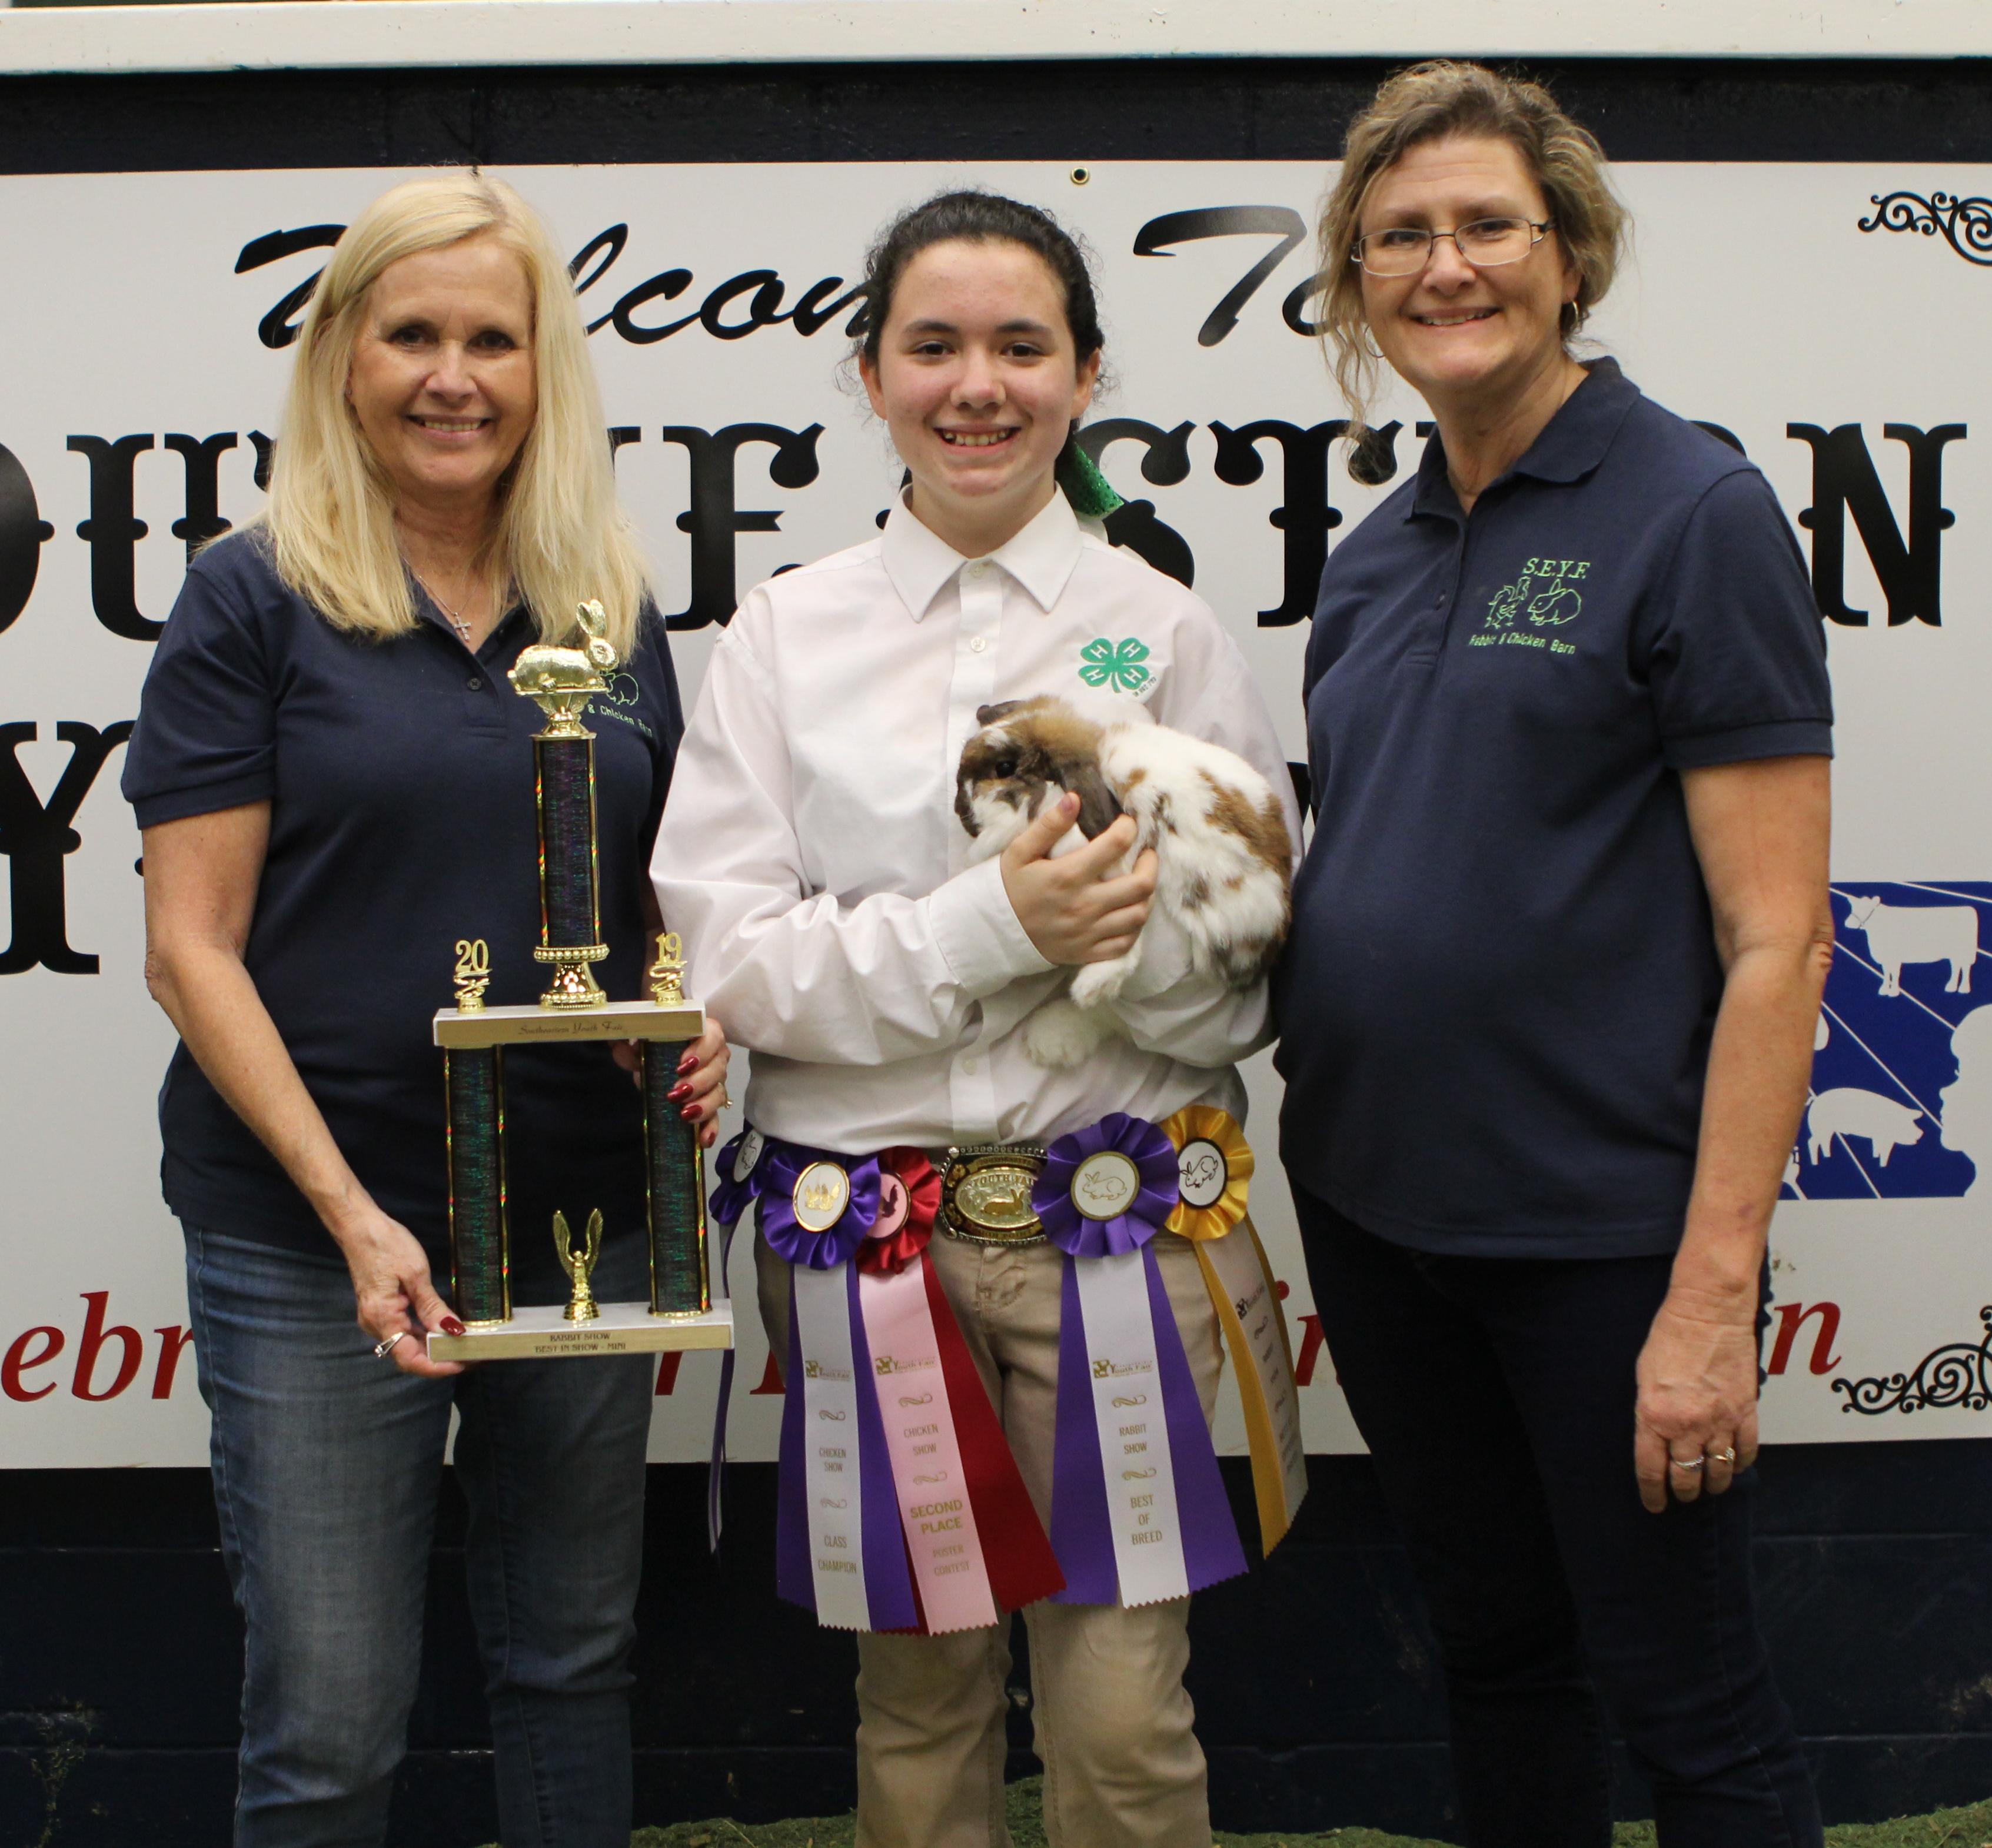 Rabbit Show Southeastern Youth Fair